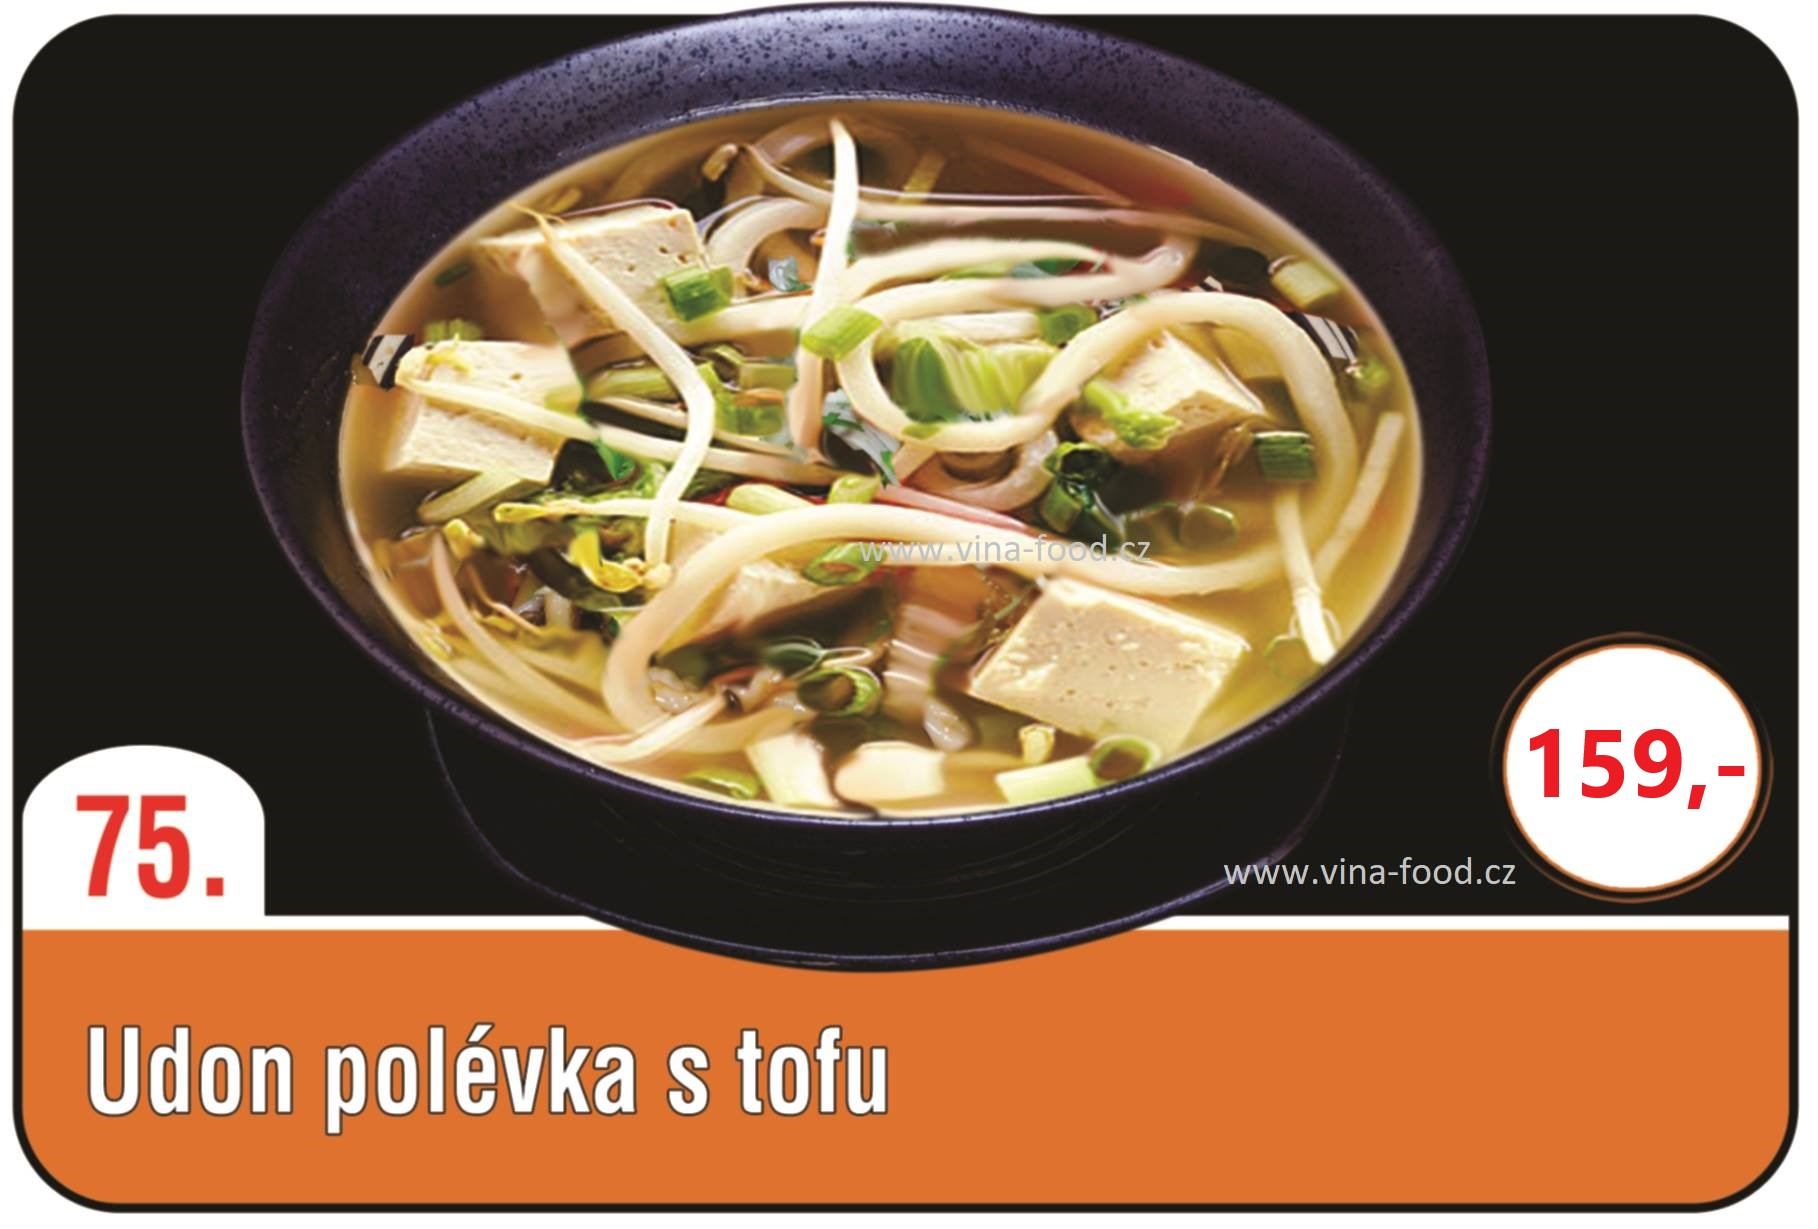 Udon Polévka s tofu